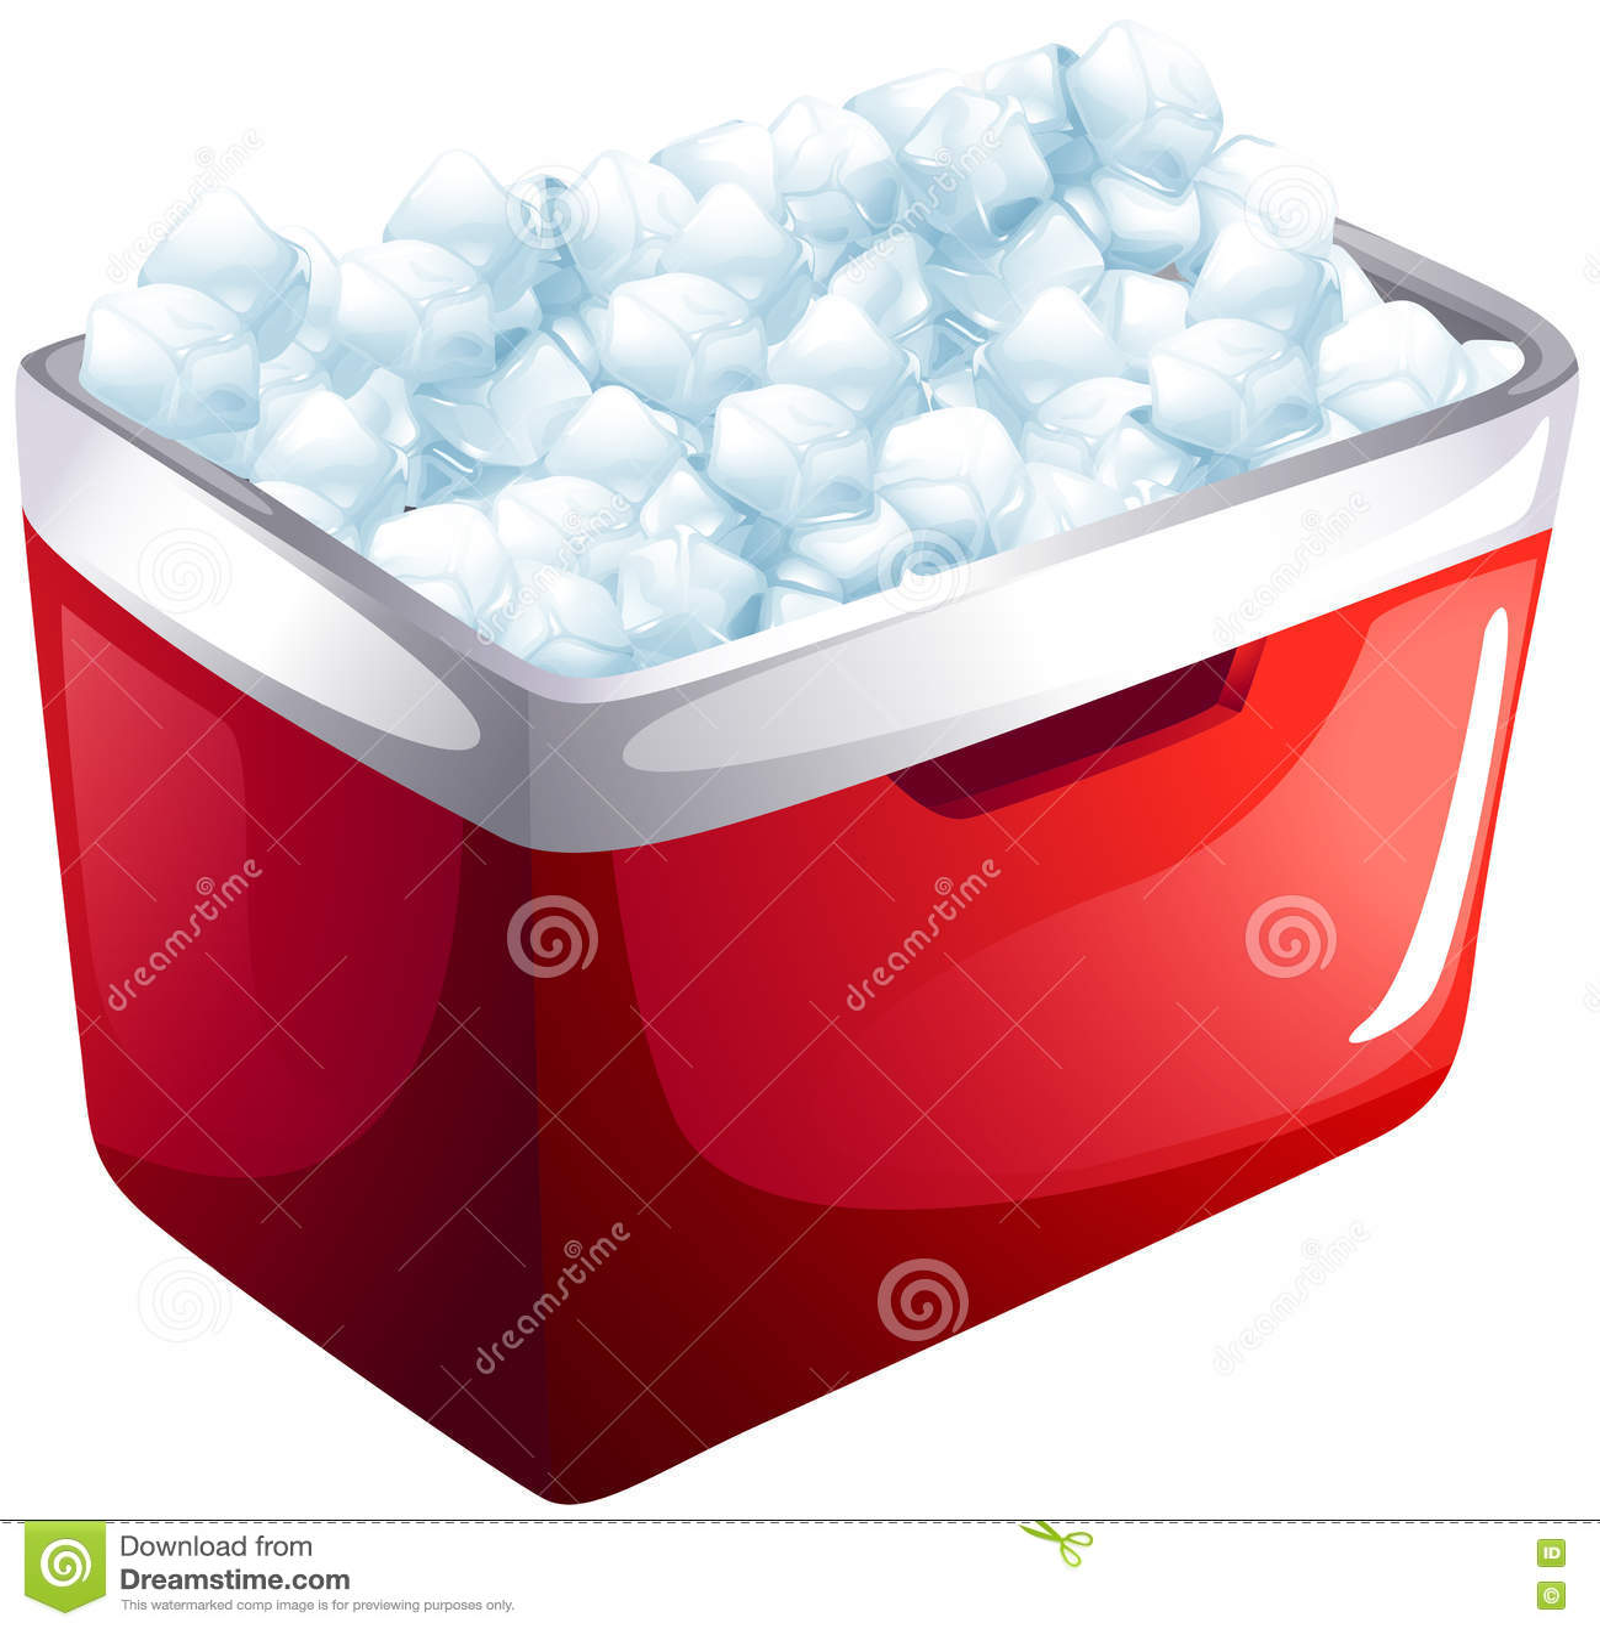 Red icebox full of ice